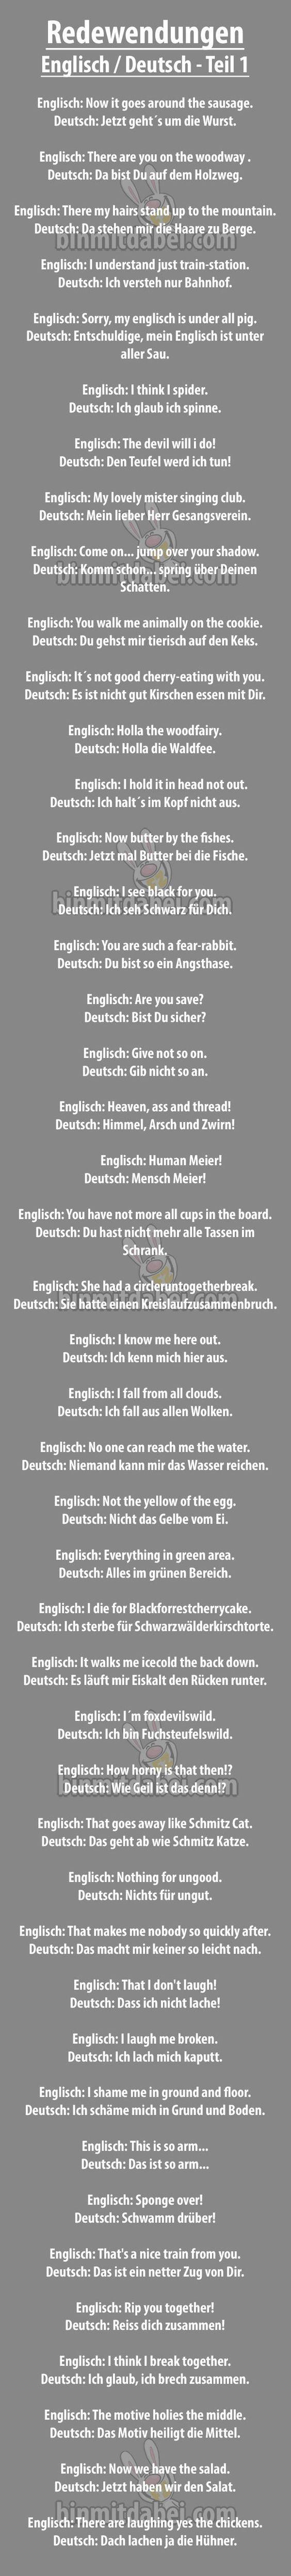 Übersetzungsbüro Arabisch deutsch München - http://www.profi-fachuebersetzung.de/uebersetzungsbueros/muenchen.html: